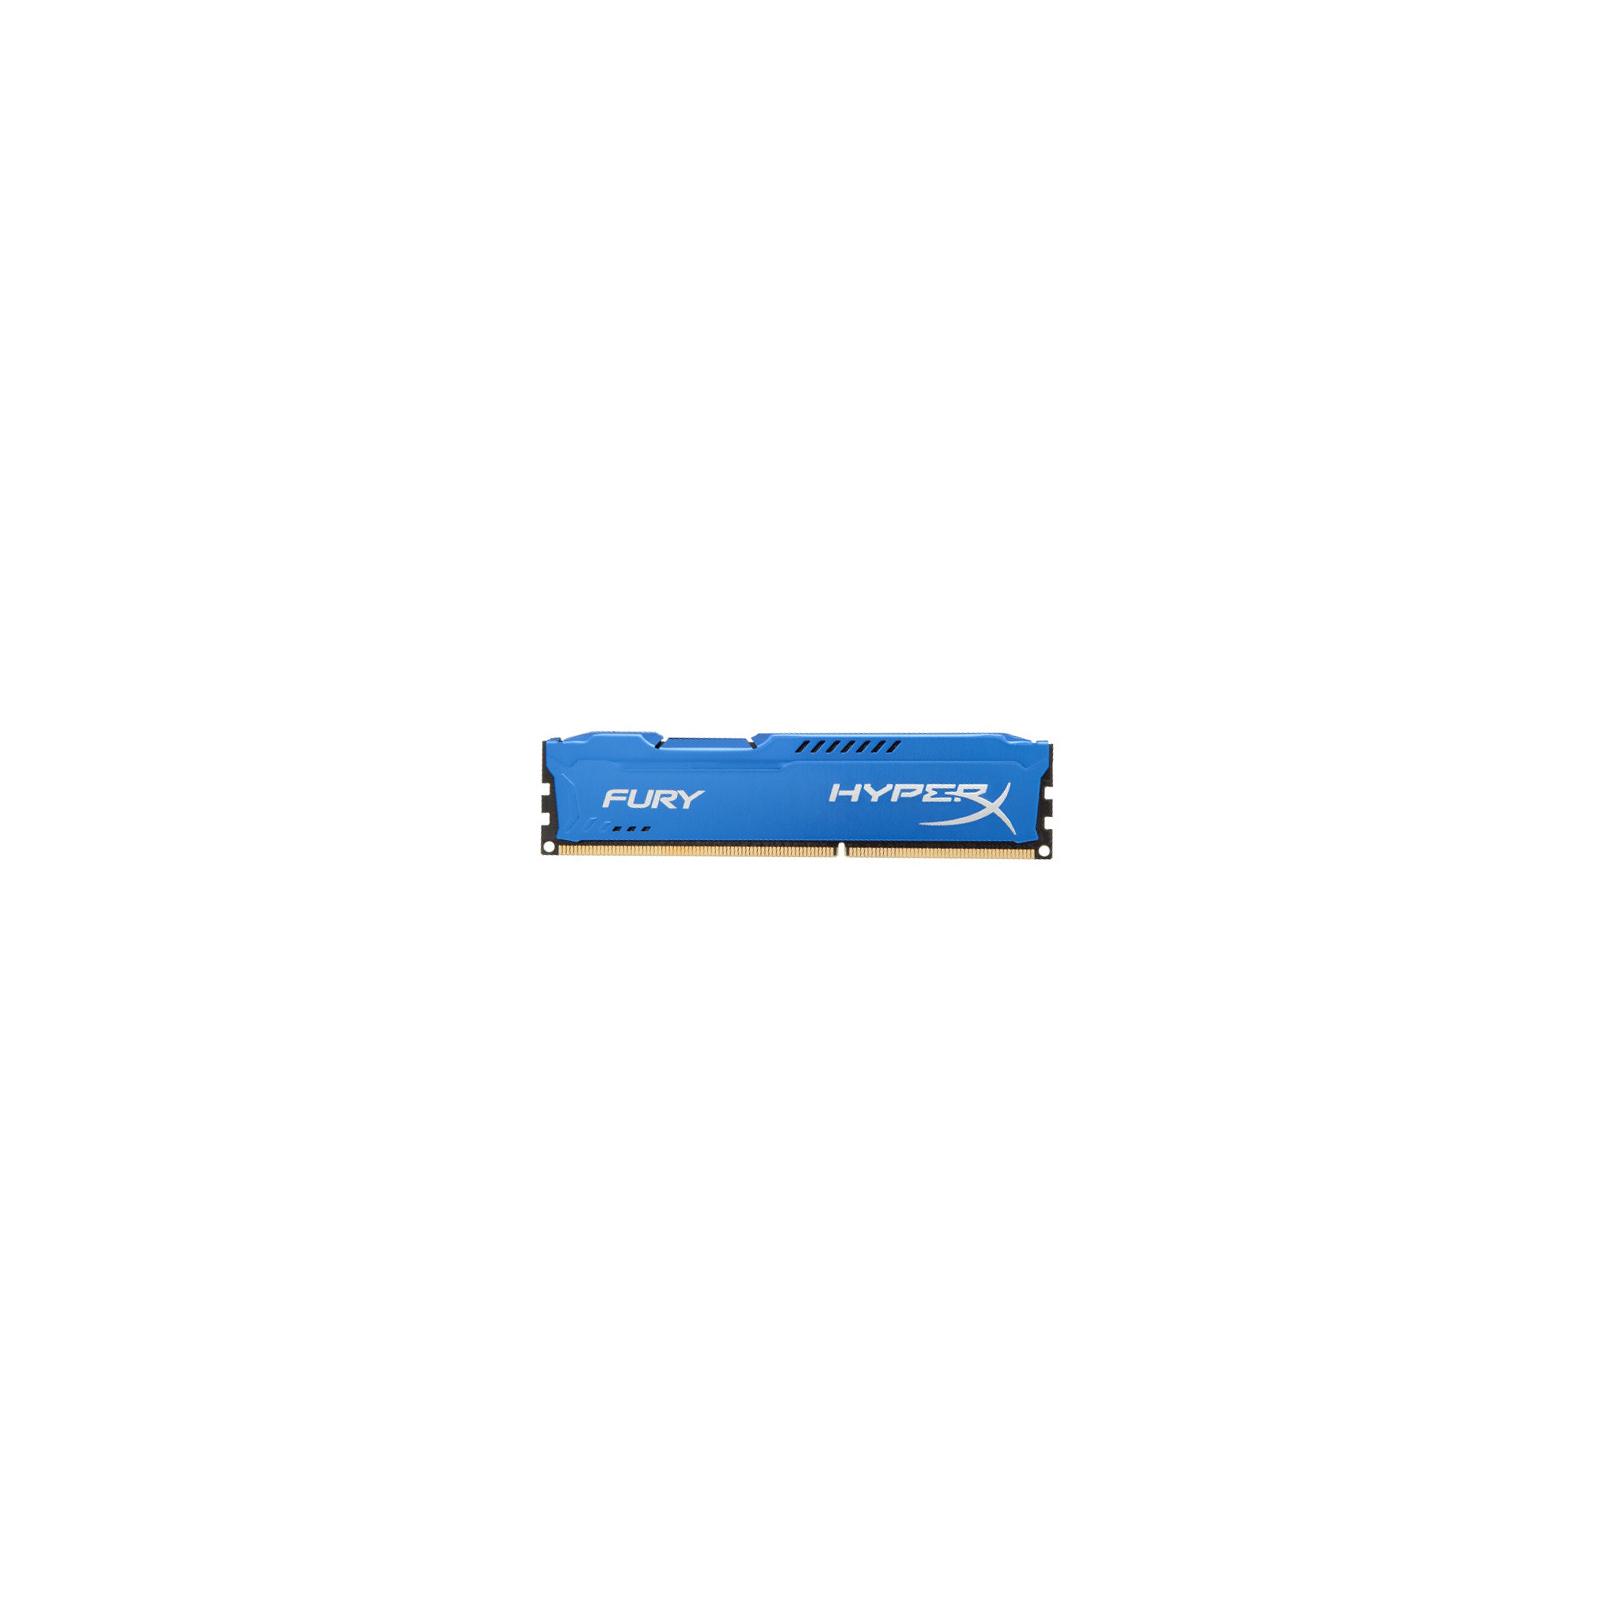 Модуль памяти для компьютера DDR3 8Gb (2x4GB) 1866 MHz HyperX Fury Blu Kingston (HX318C10FK2/8) изображение 3